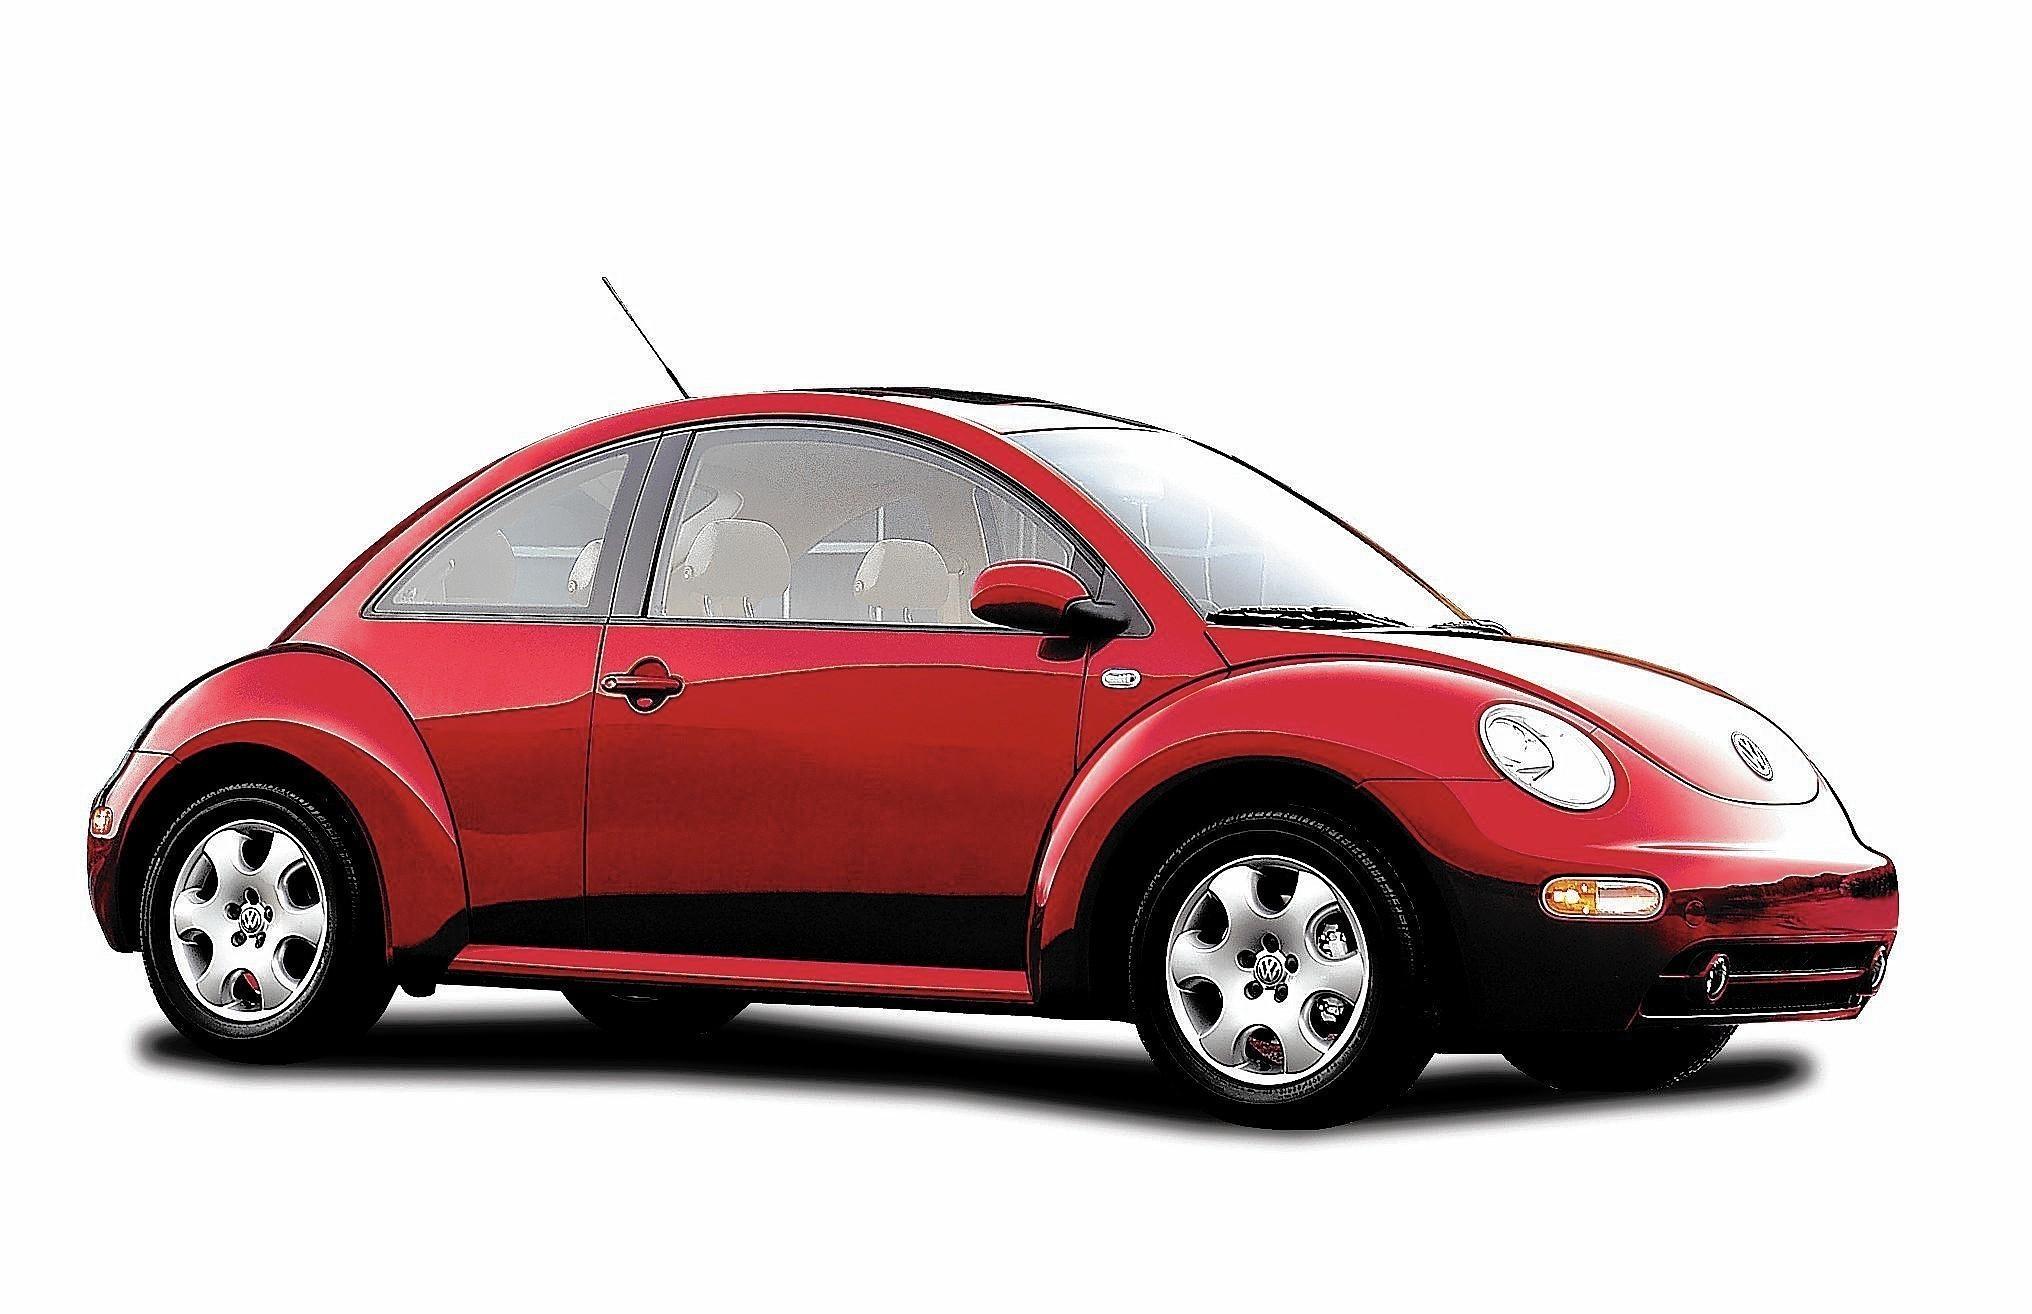 sale for like of official odyssey volkswagen on facebook pink the beetle rules slugbug